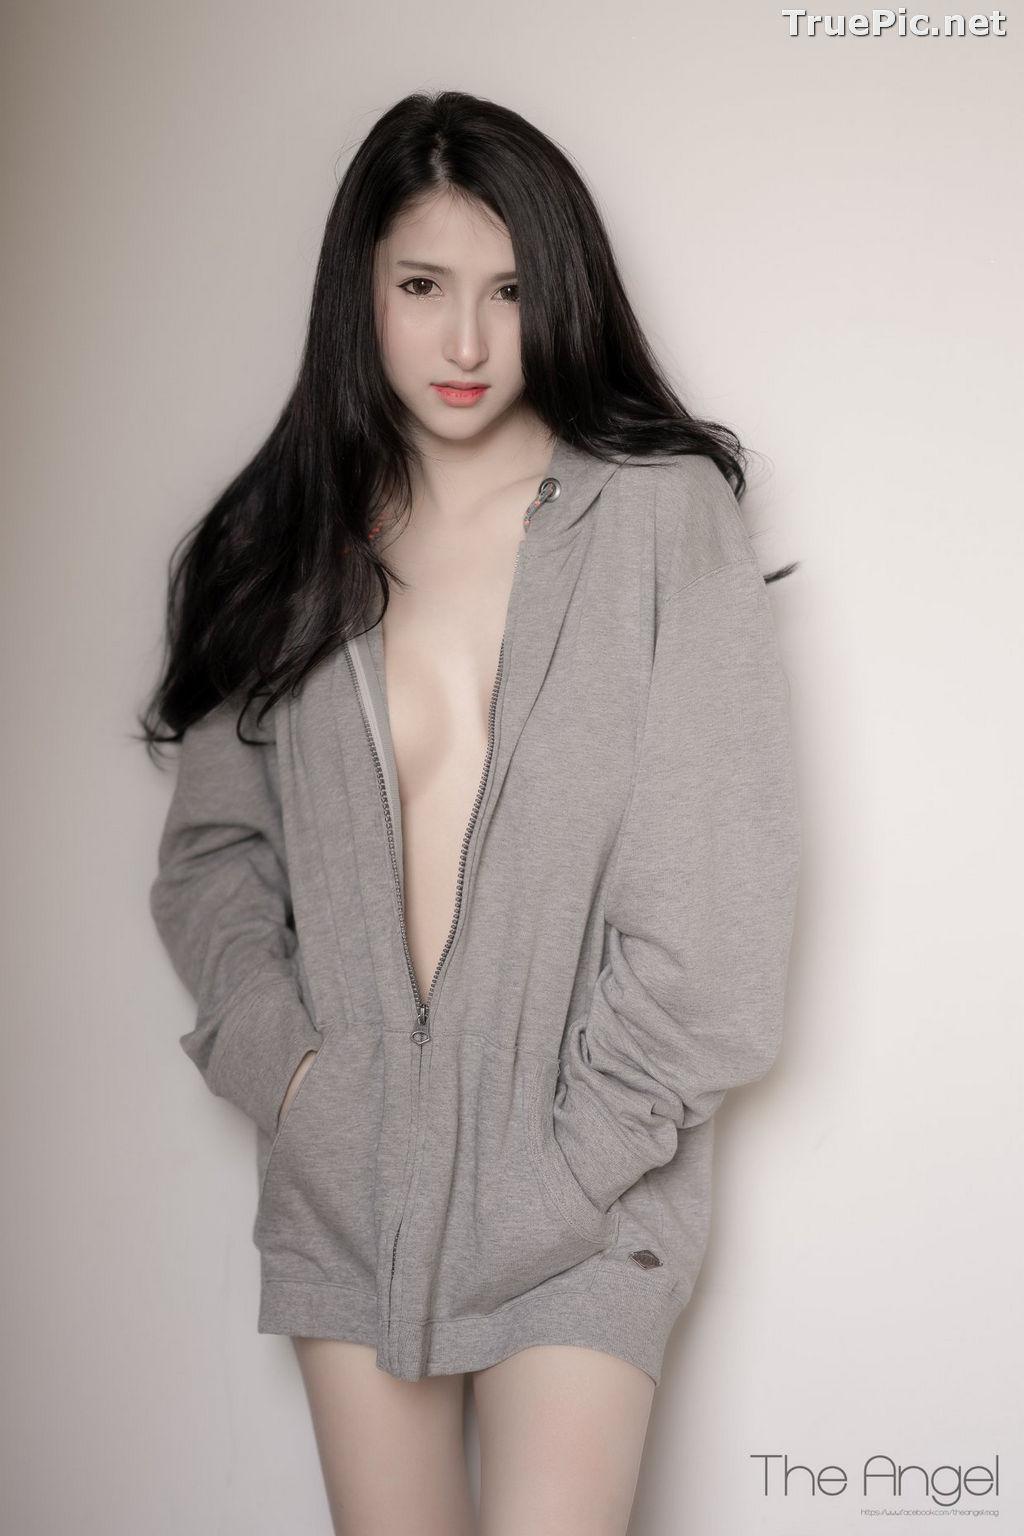 Image Thailand Model - เอมี่ เอมิลี่ - My Beautiful Angel - TruePic.net - Picture-5